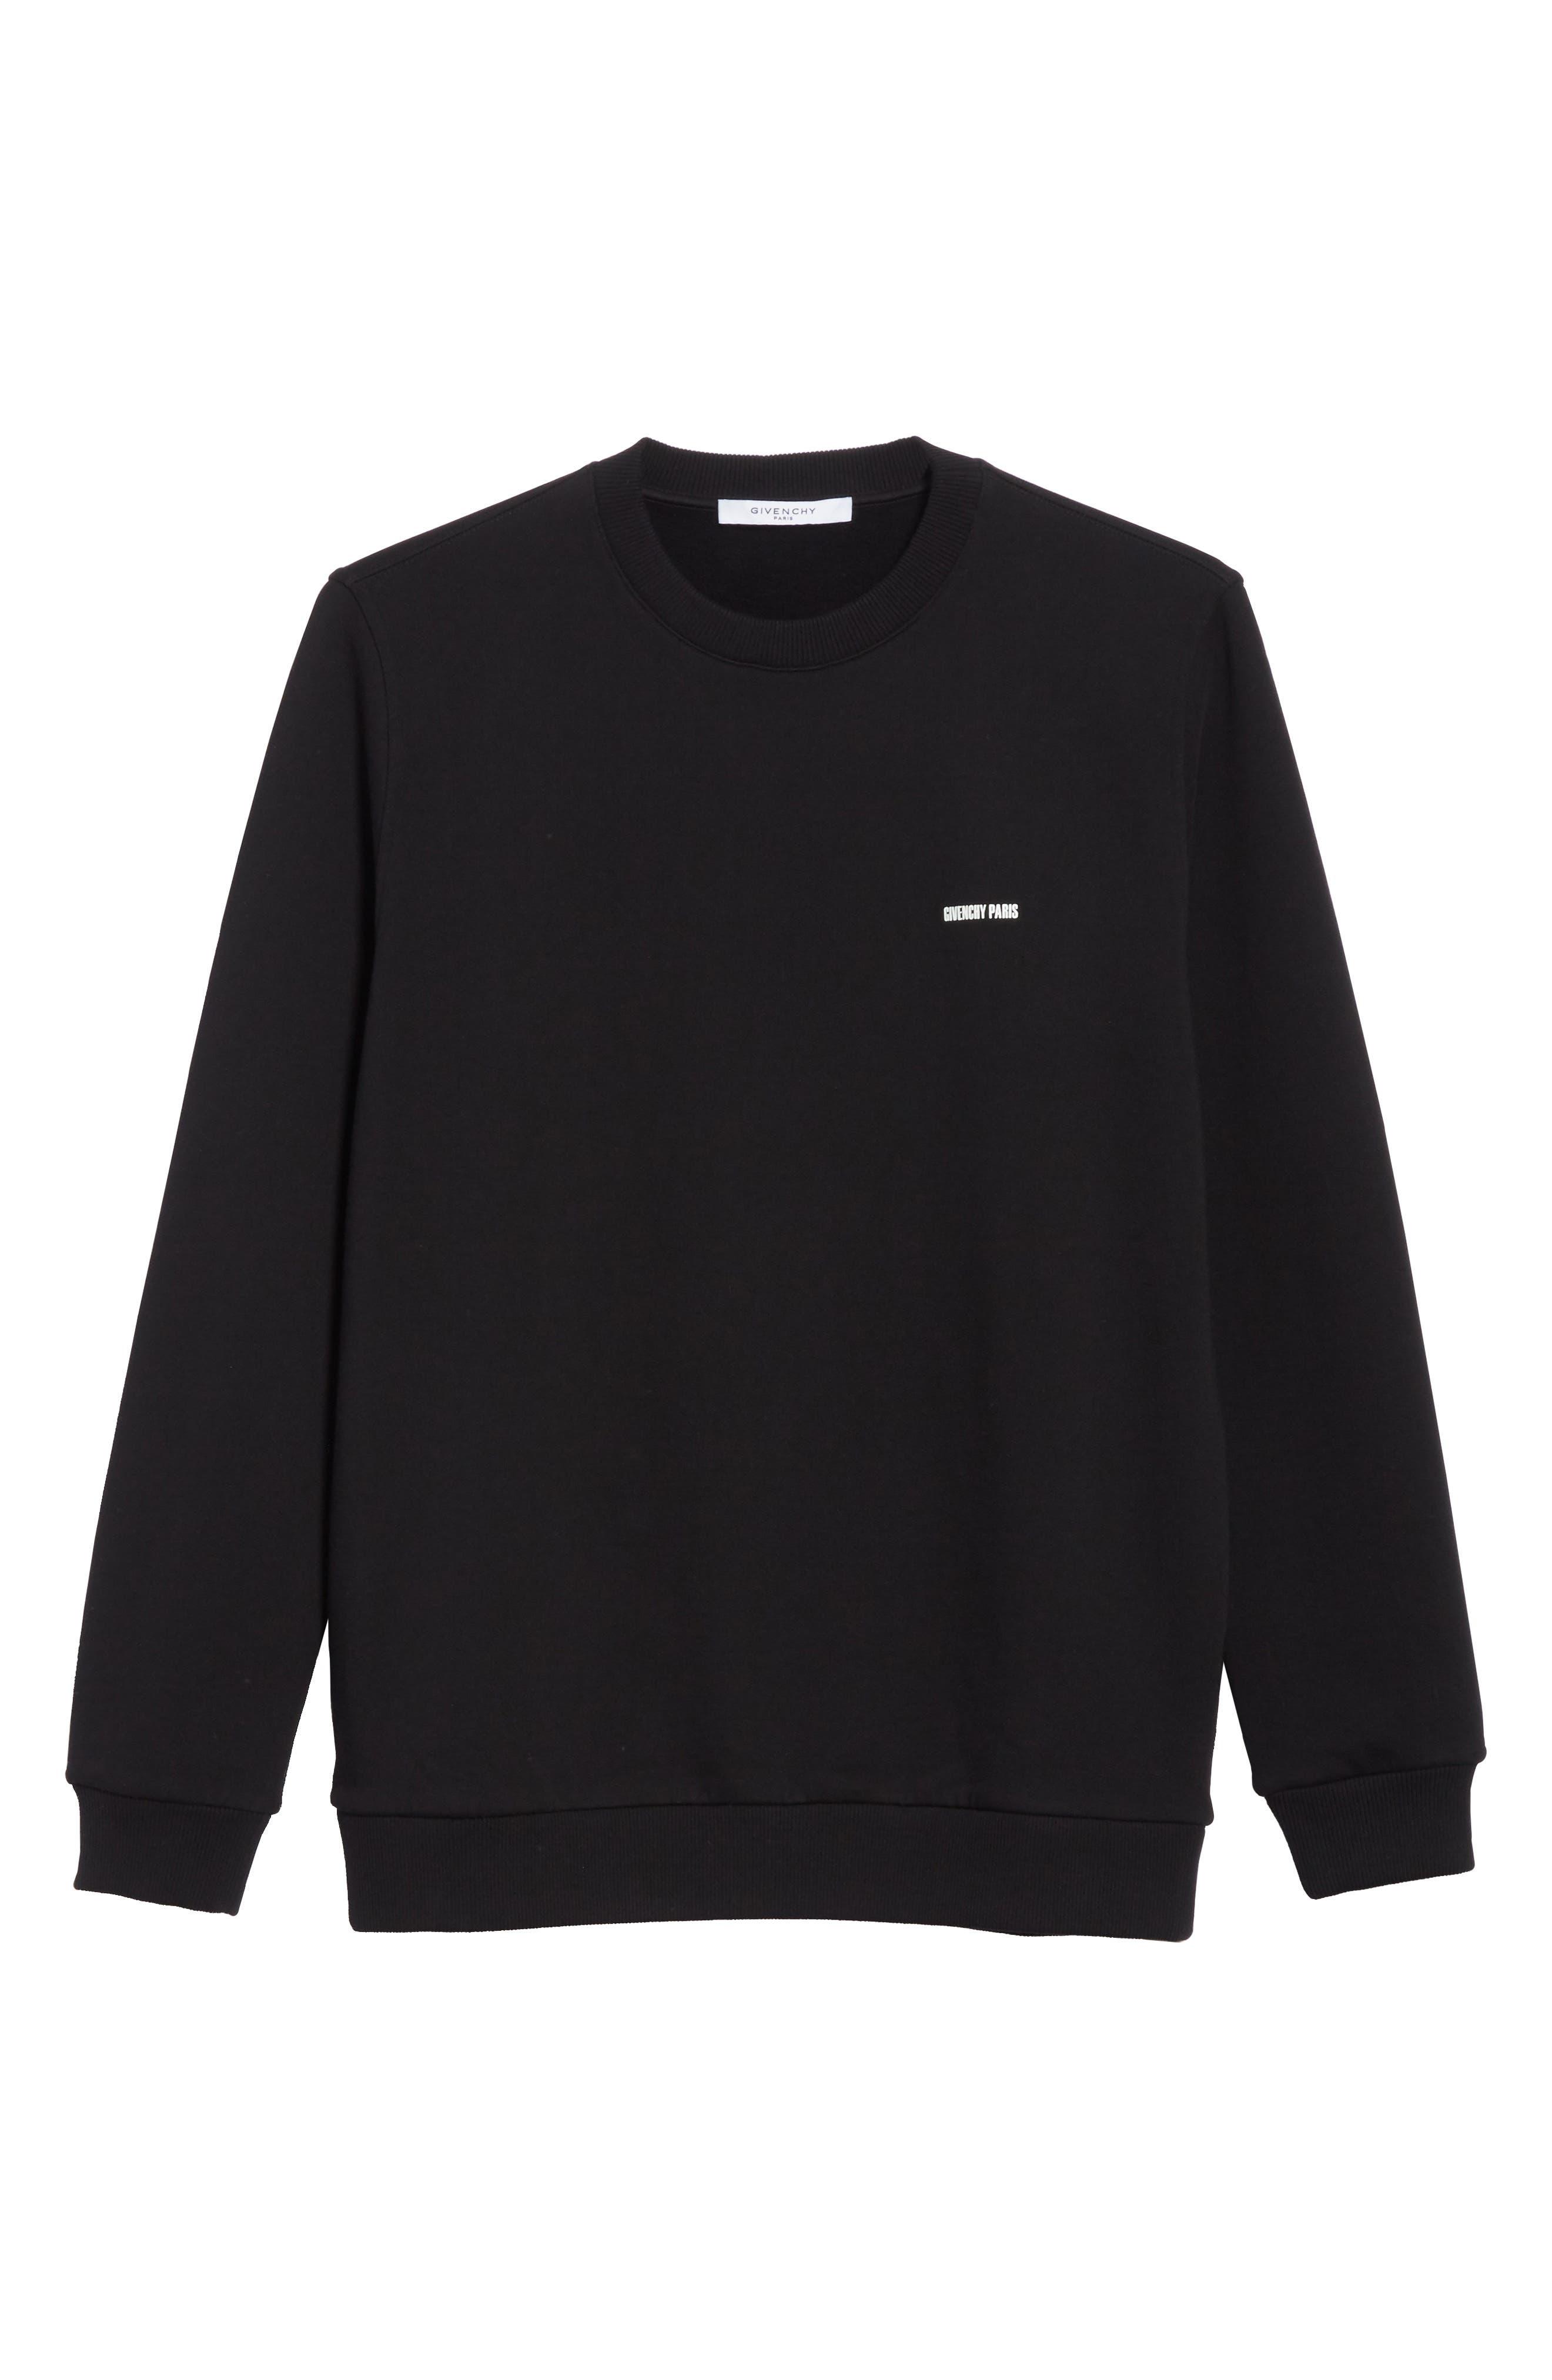 Original Crewneck Sweatshirt,                             Alternate thumbnail 6, color,                             001